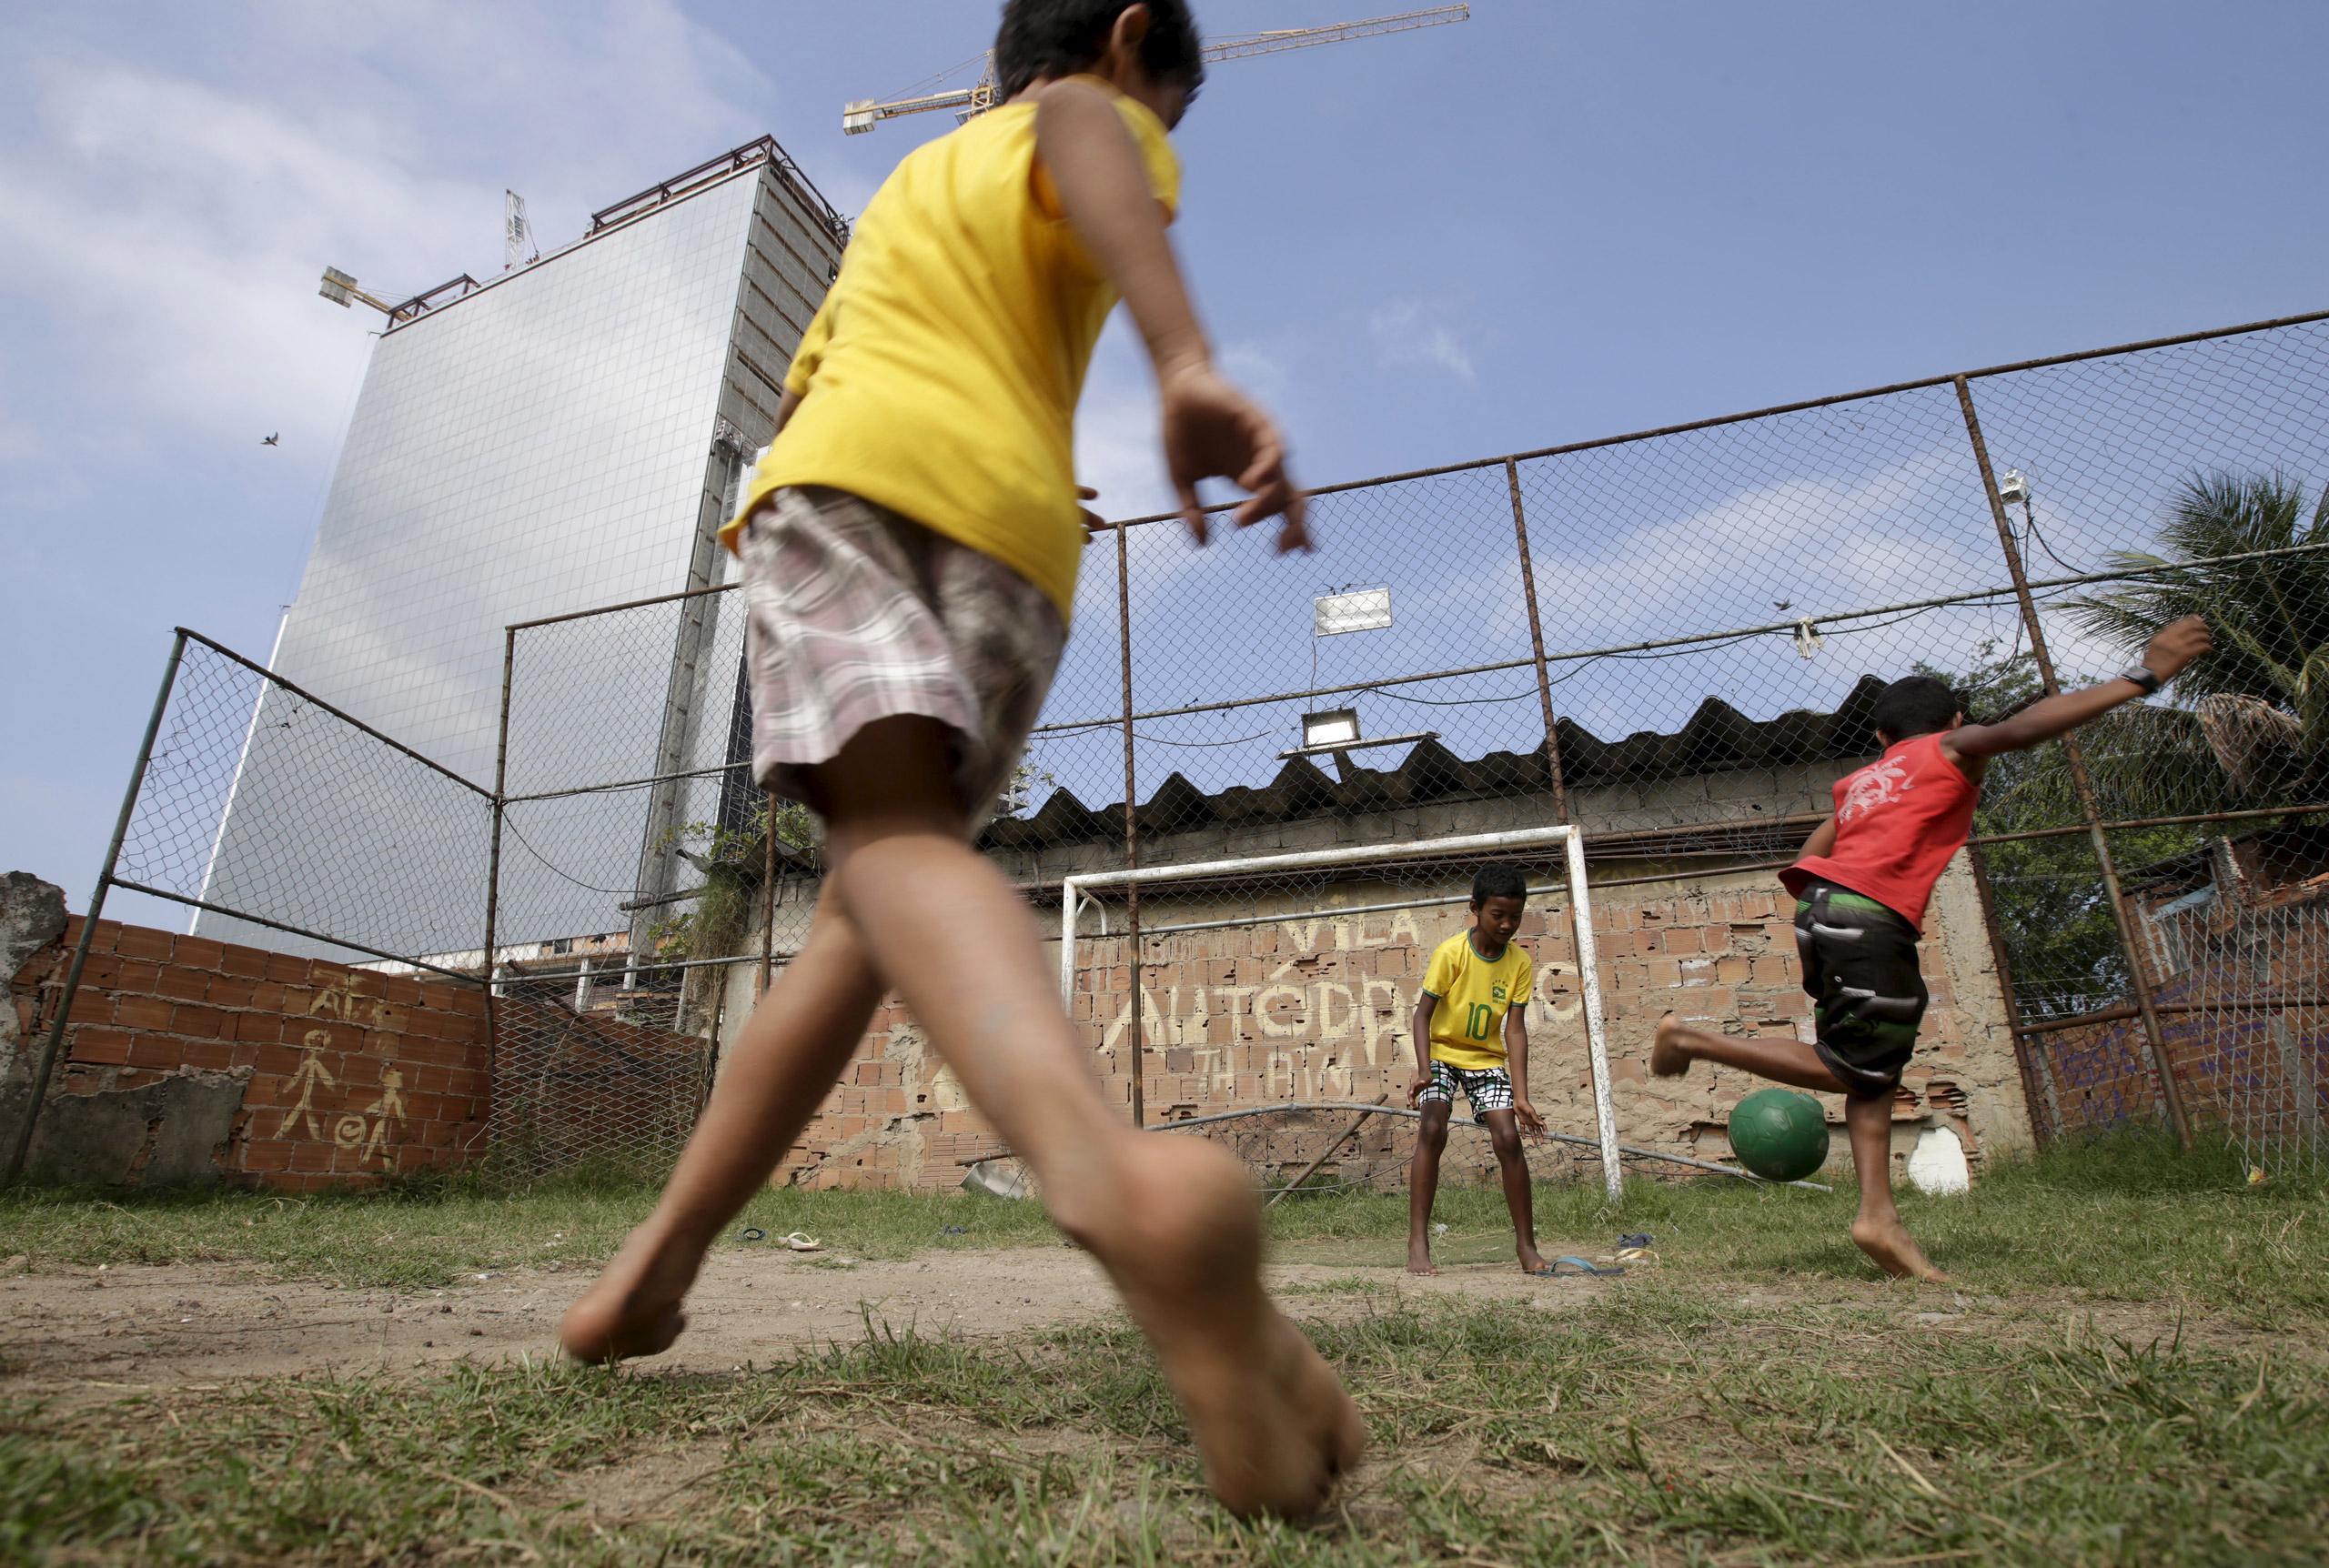 Children play soccer in the Vila Autodromo slum in Rio de Janeiro on July 28, 2015.